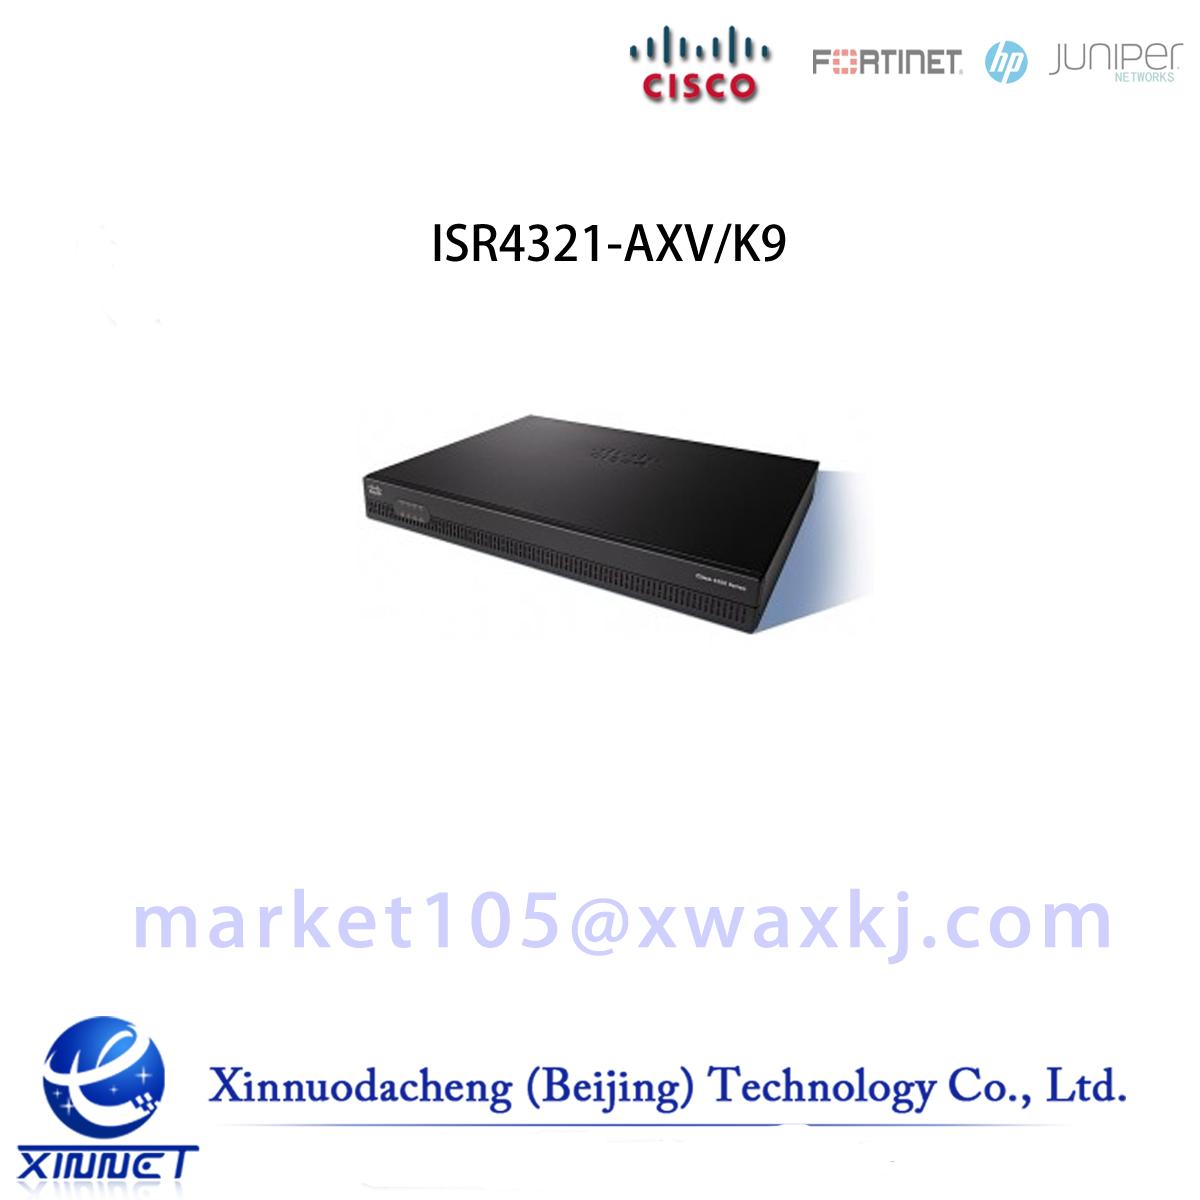 Cisco ISR 4321 AXV Bundle, w/APP, SEC, UC lic, CUBE-10 ISR4321-AXV/K9